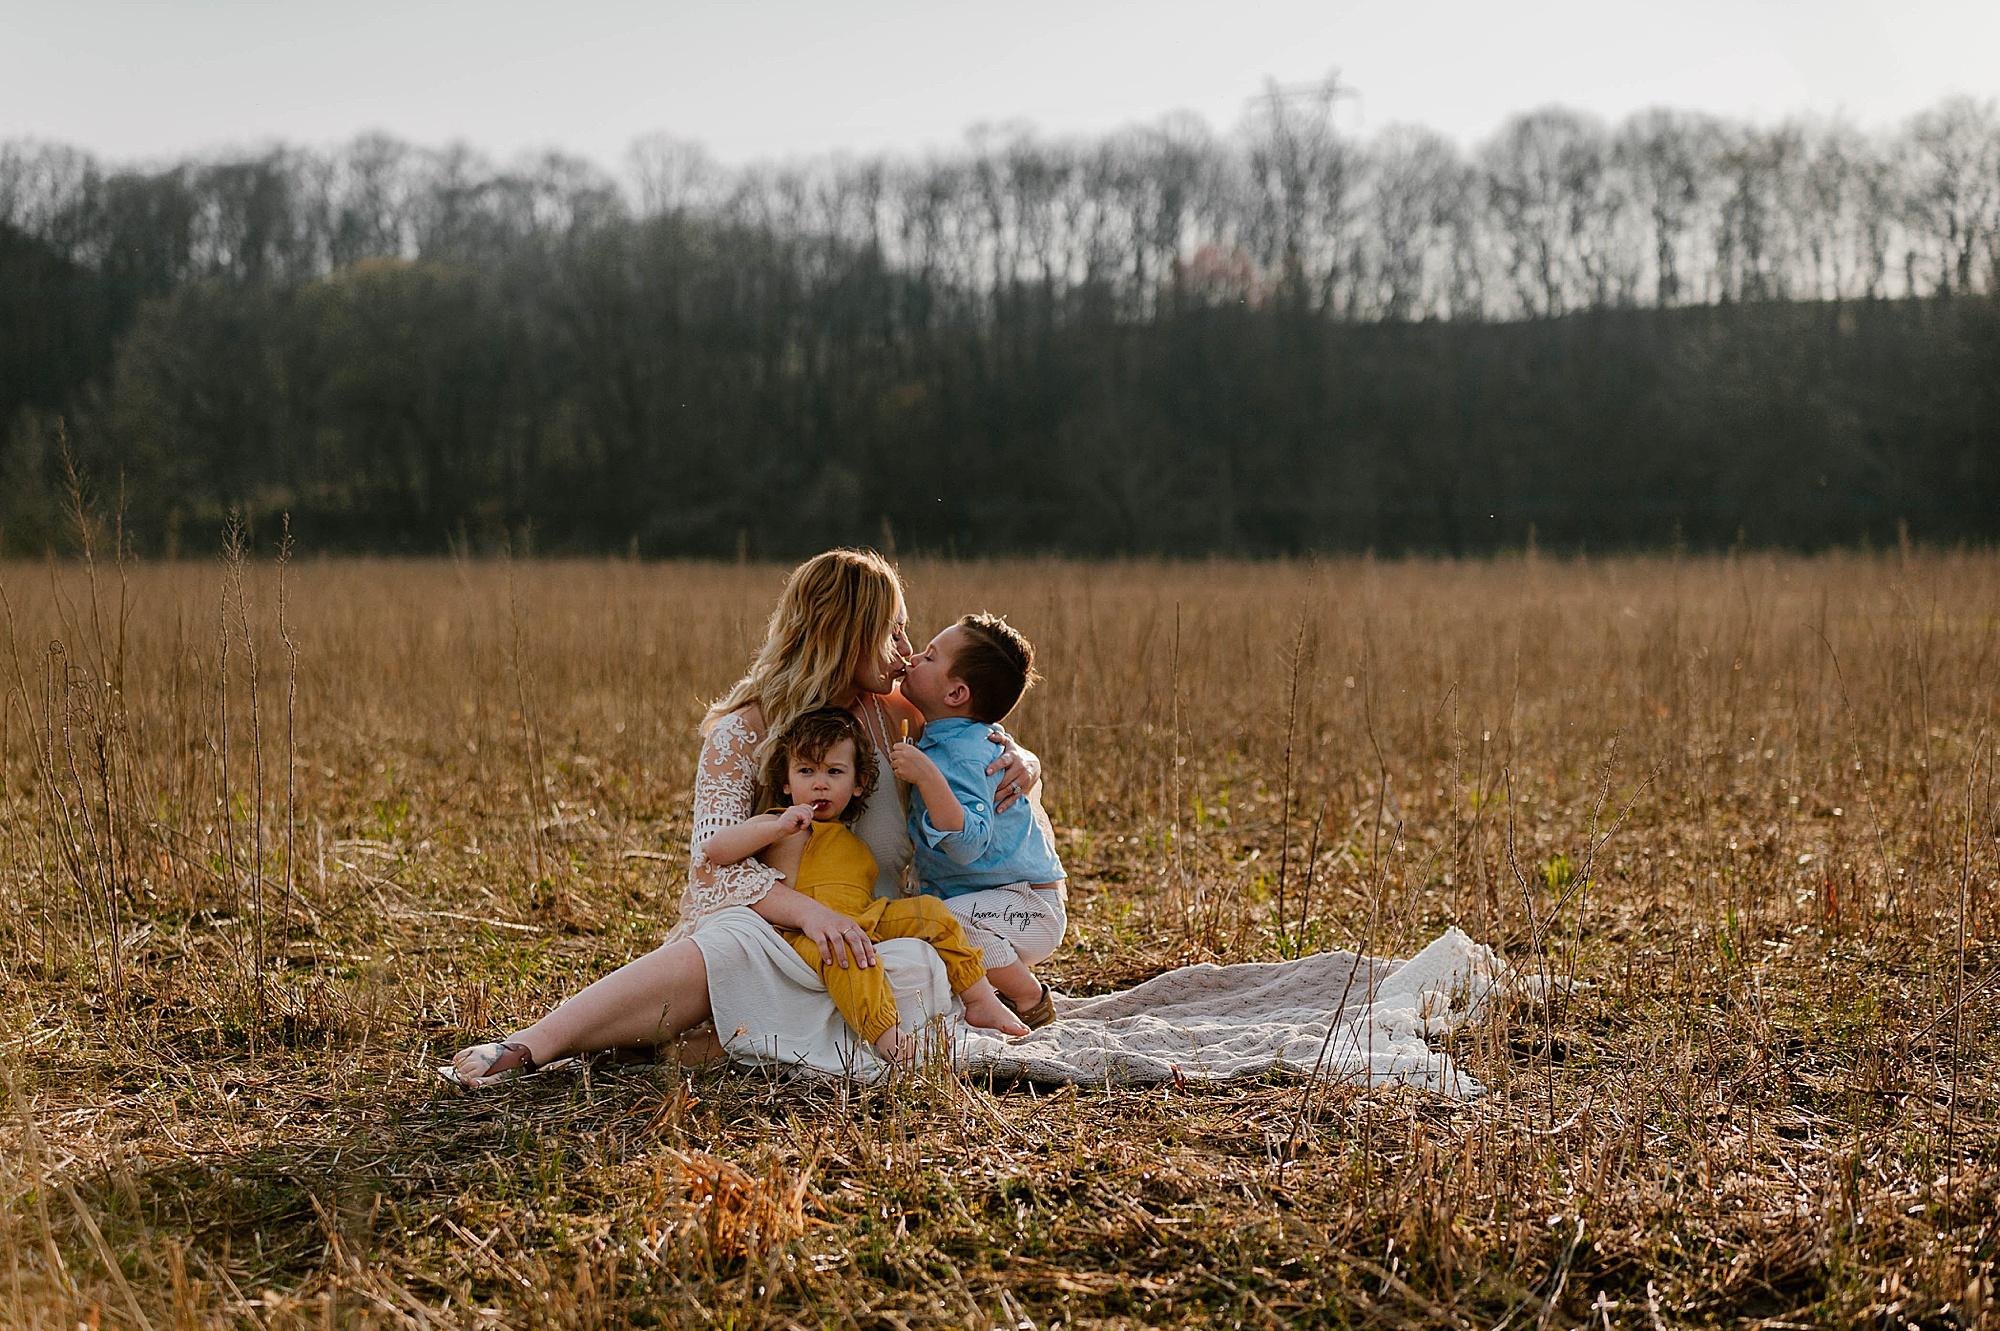 lauren-grayson-photography-akron-ohio-family-mom-boys-field-spring-outdoor-session_0021.jpg